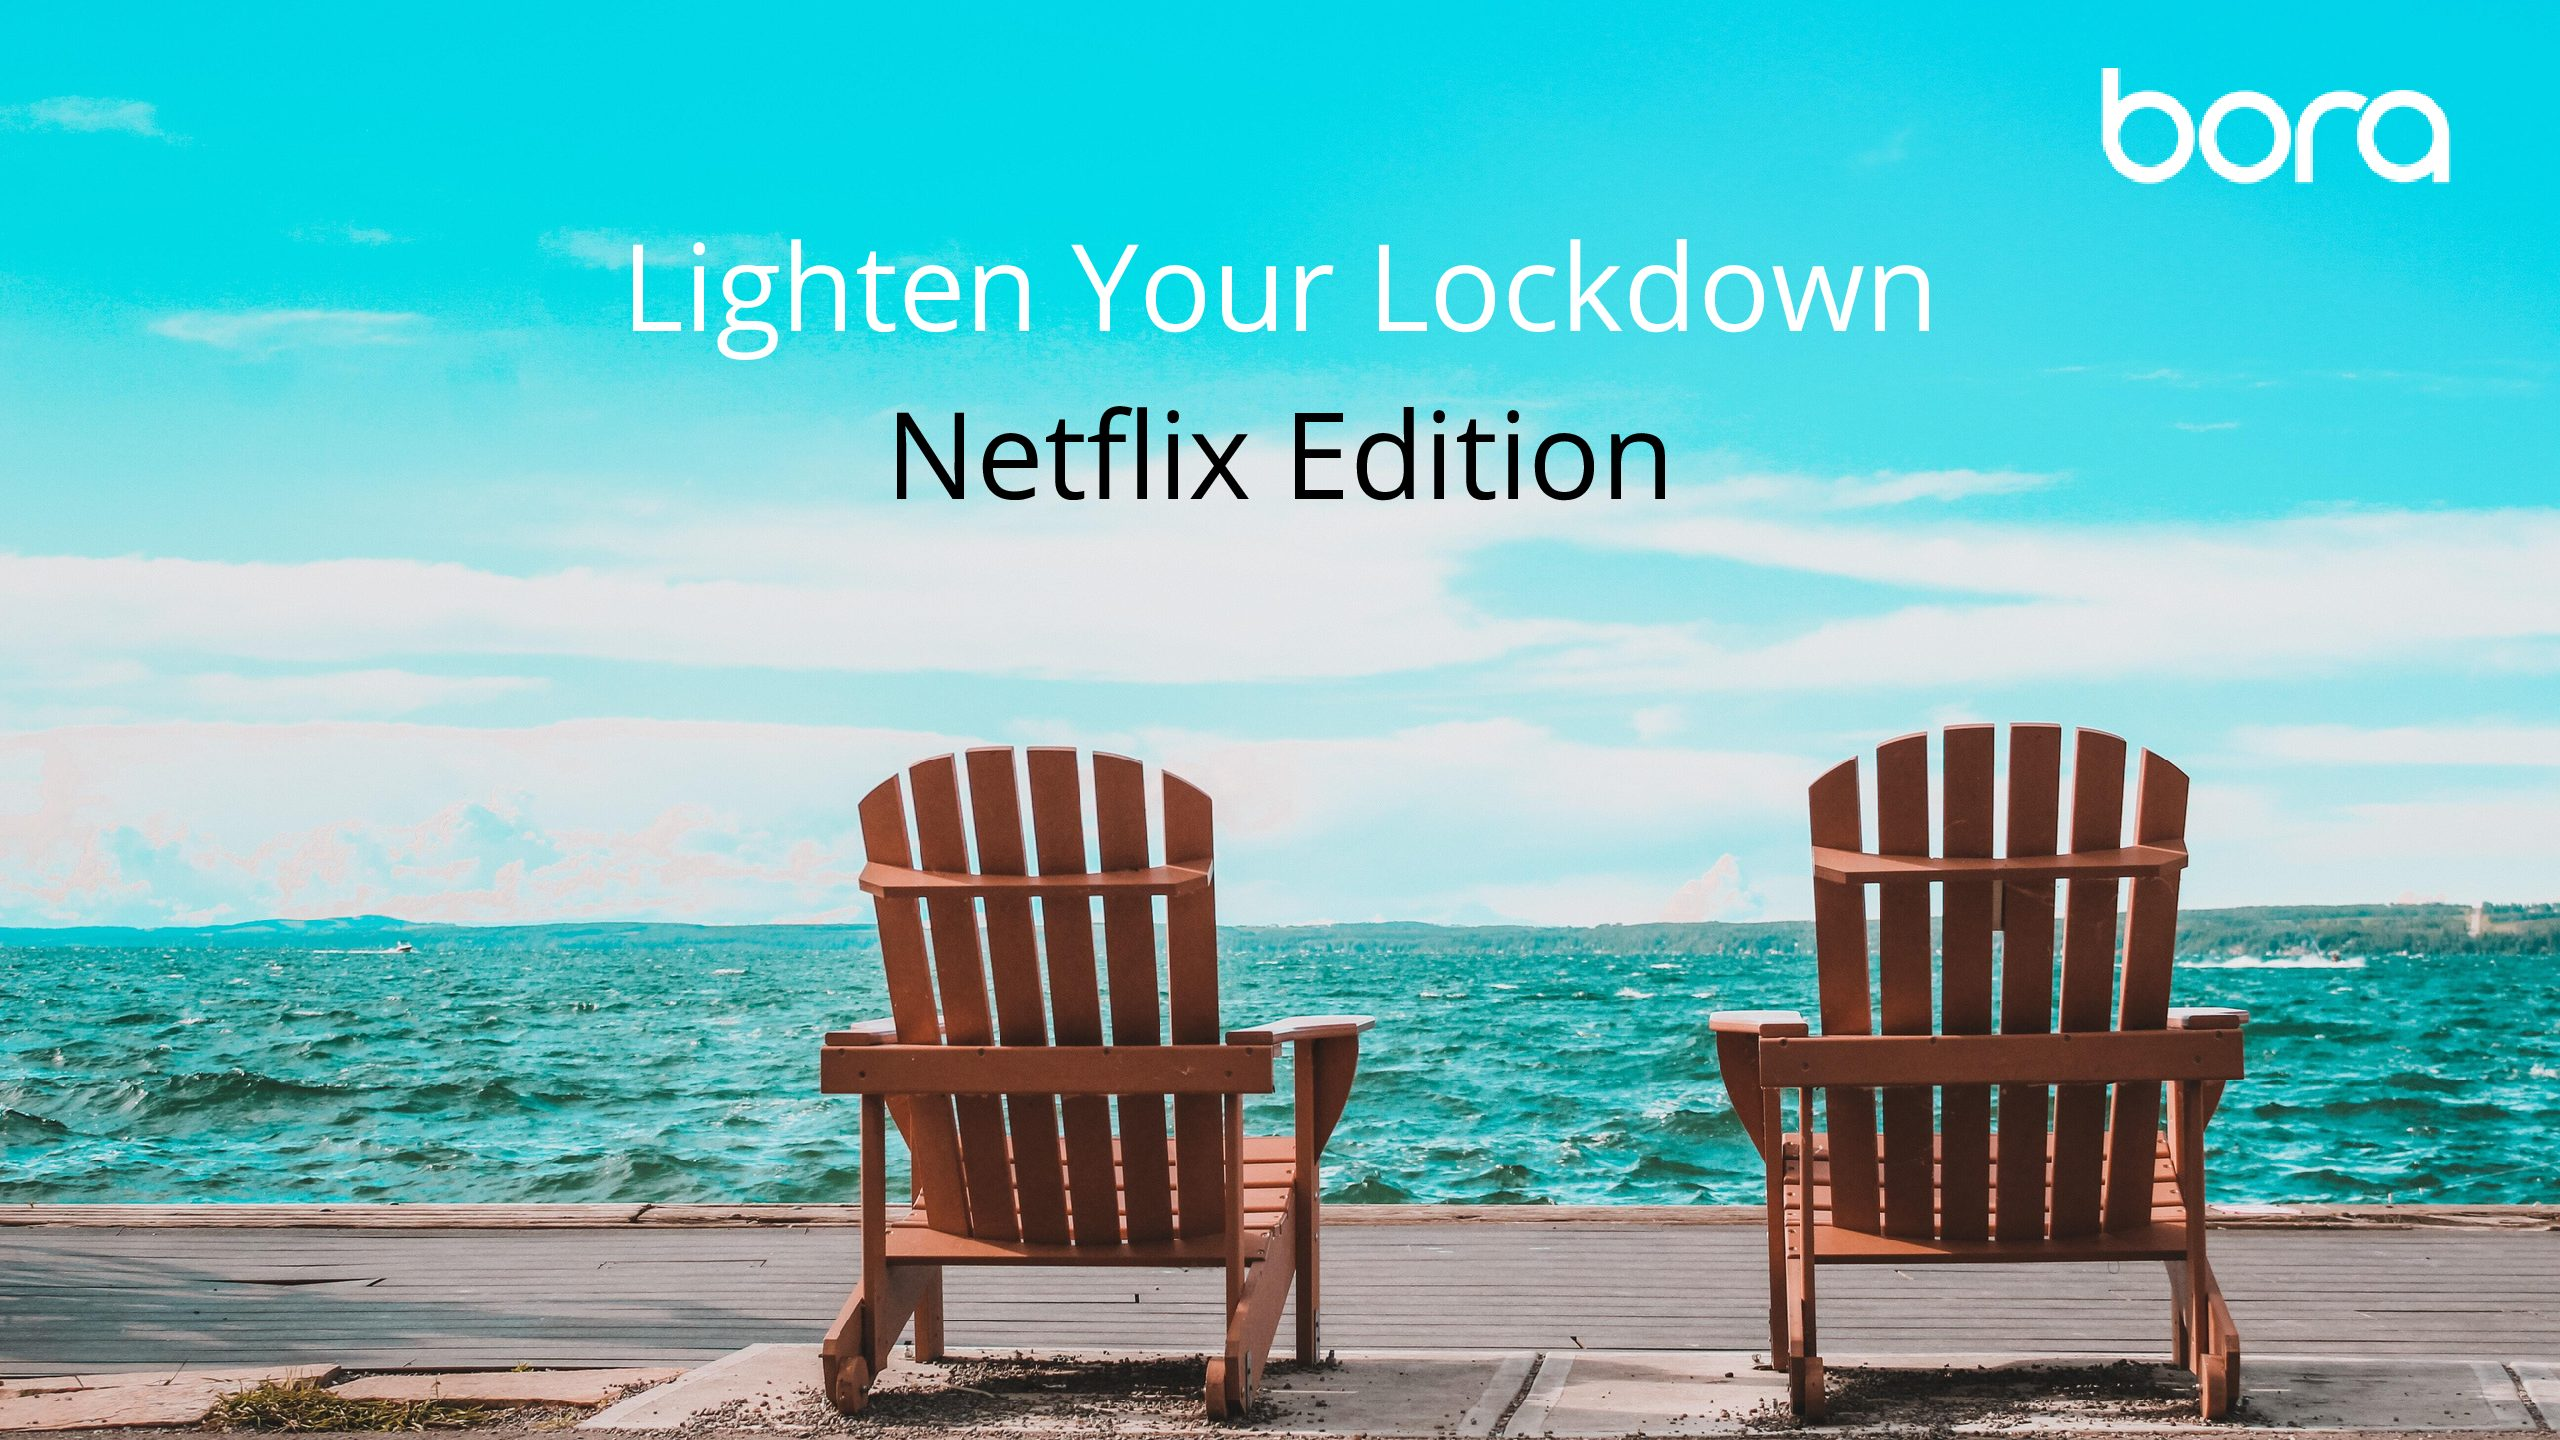 Lighten Your Lockdown: Netflix Edition